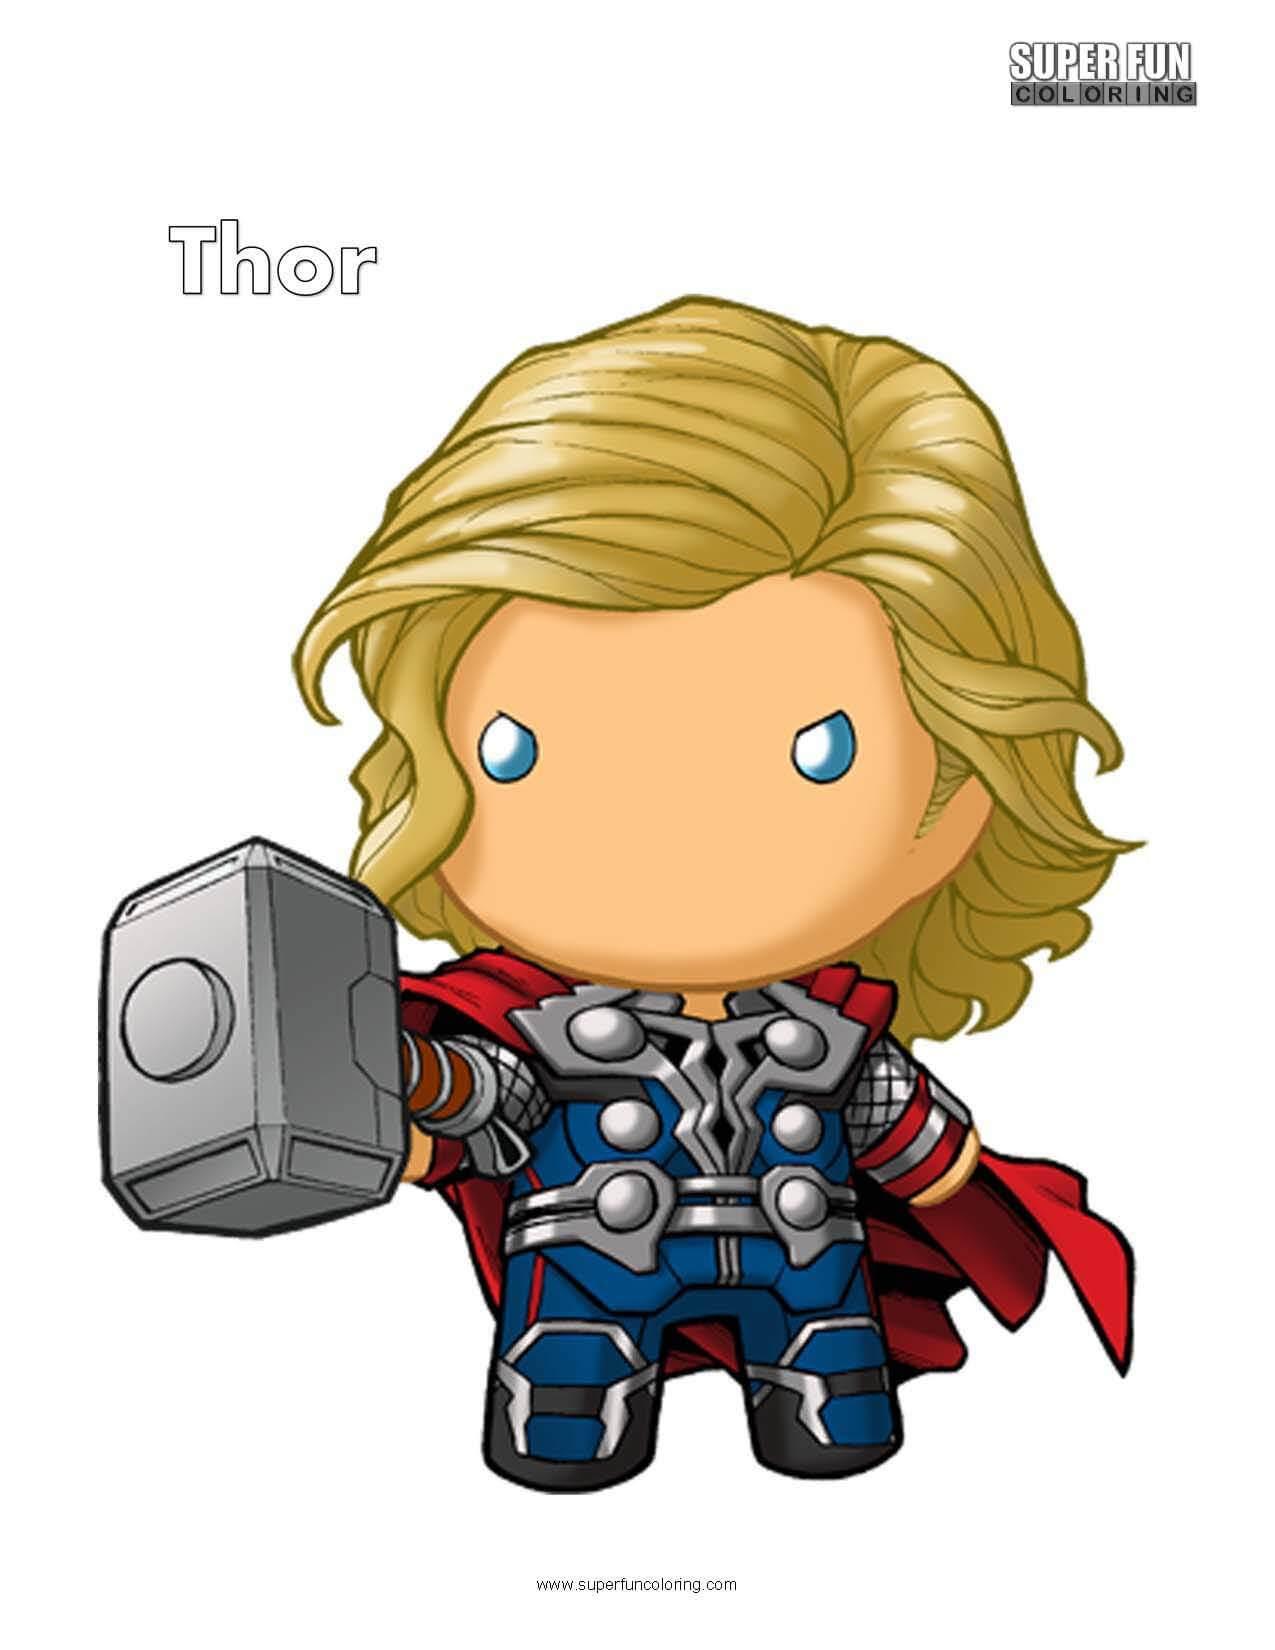 Cute Thor Free Superhero Coloring Page